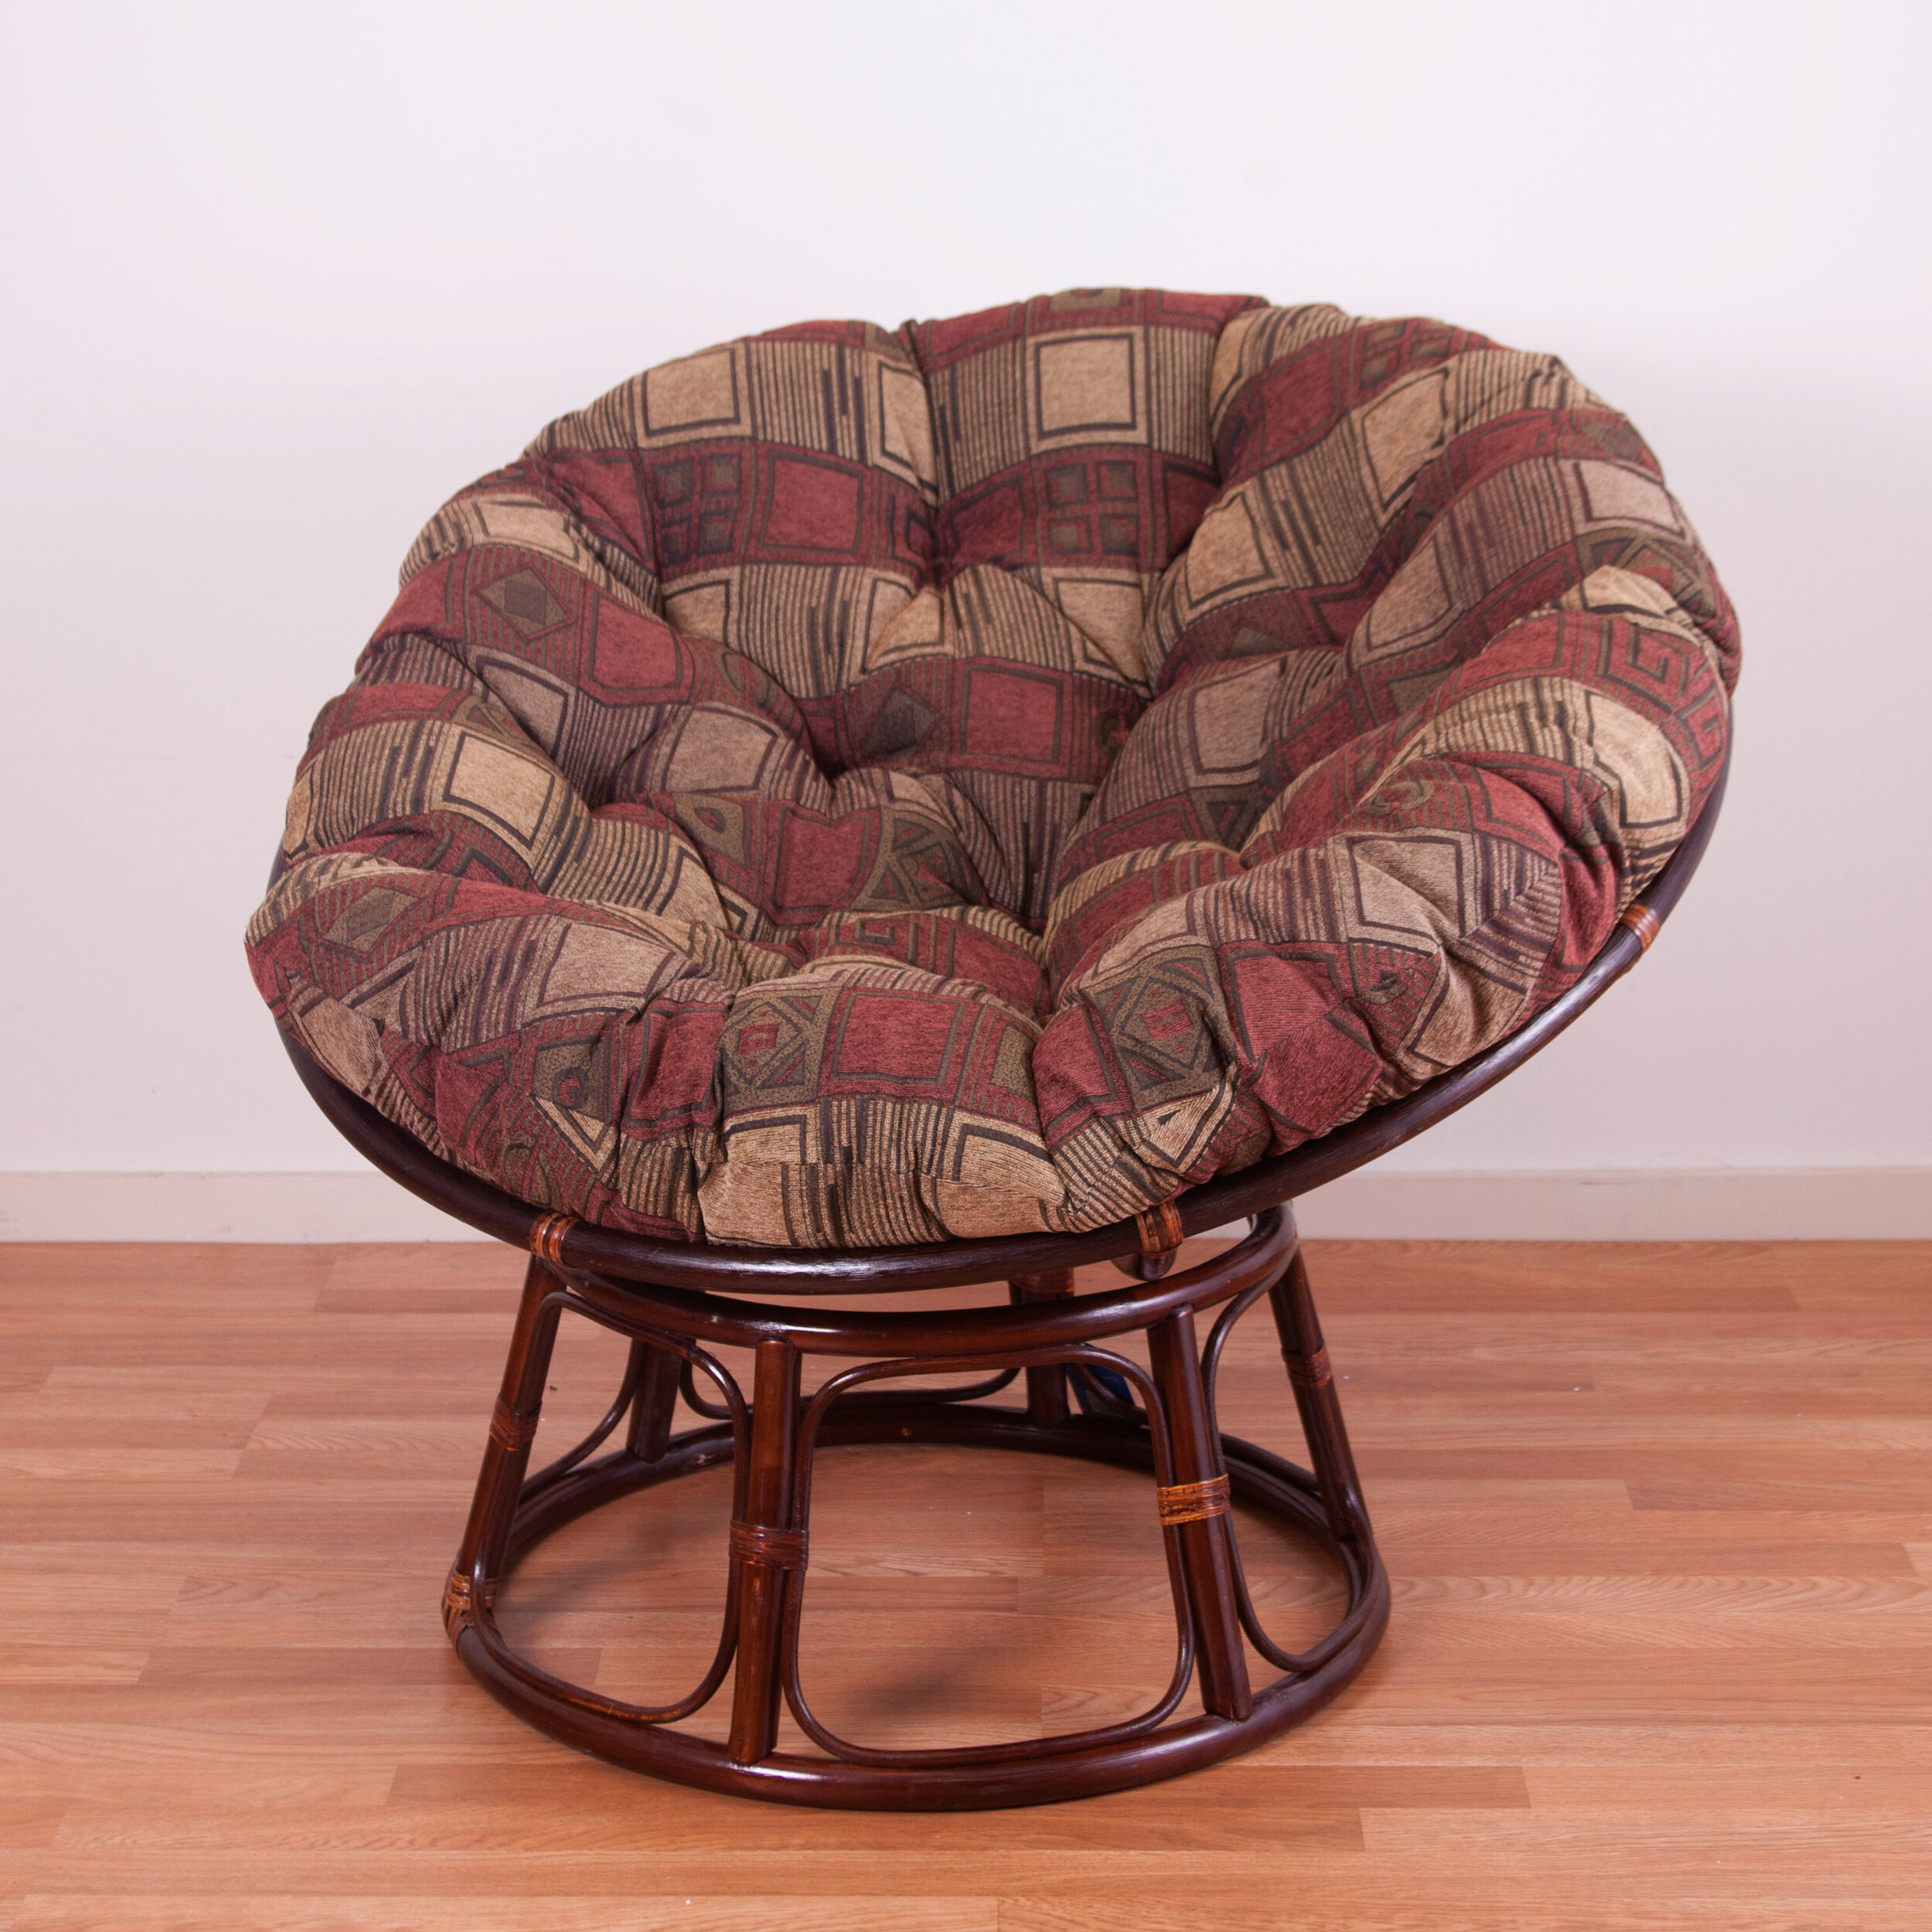 Orndorff Tufted Papasan Chairs Within 2020 Bouirou Papasan Chair (View 8 of 20)